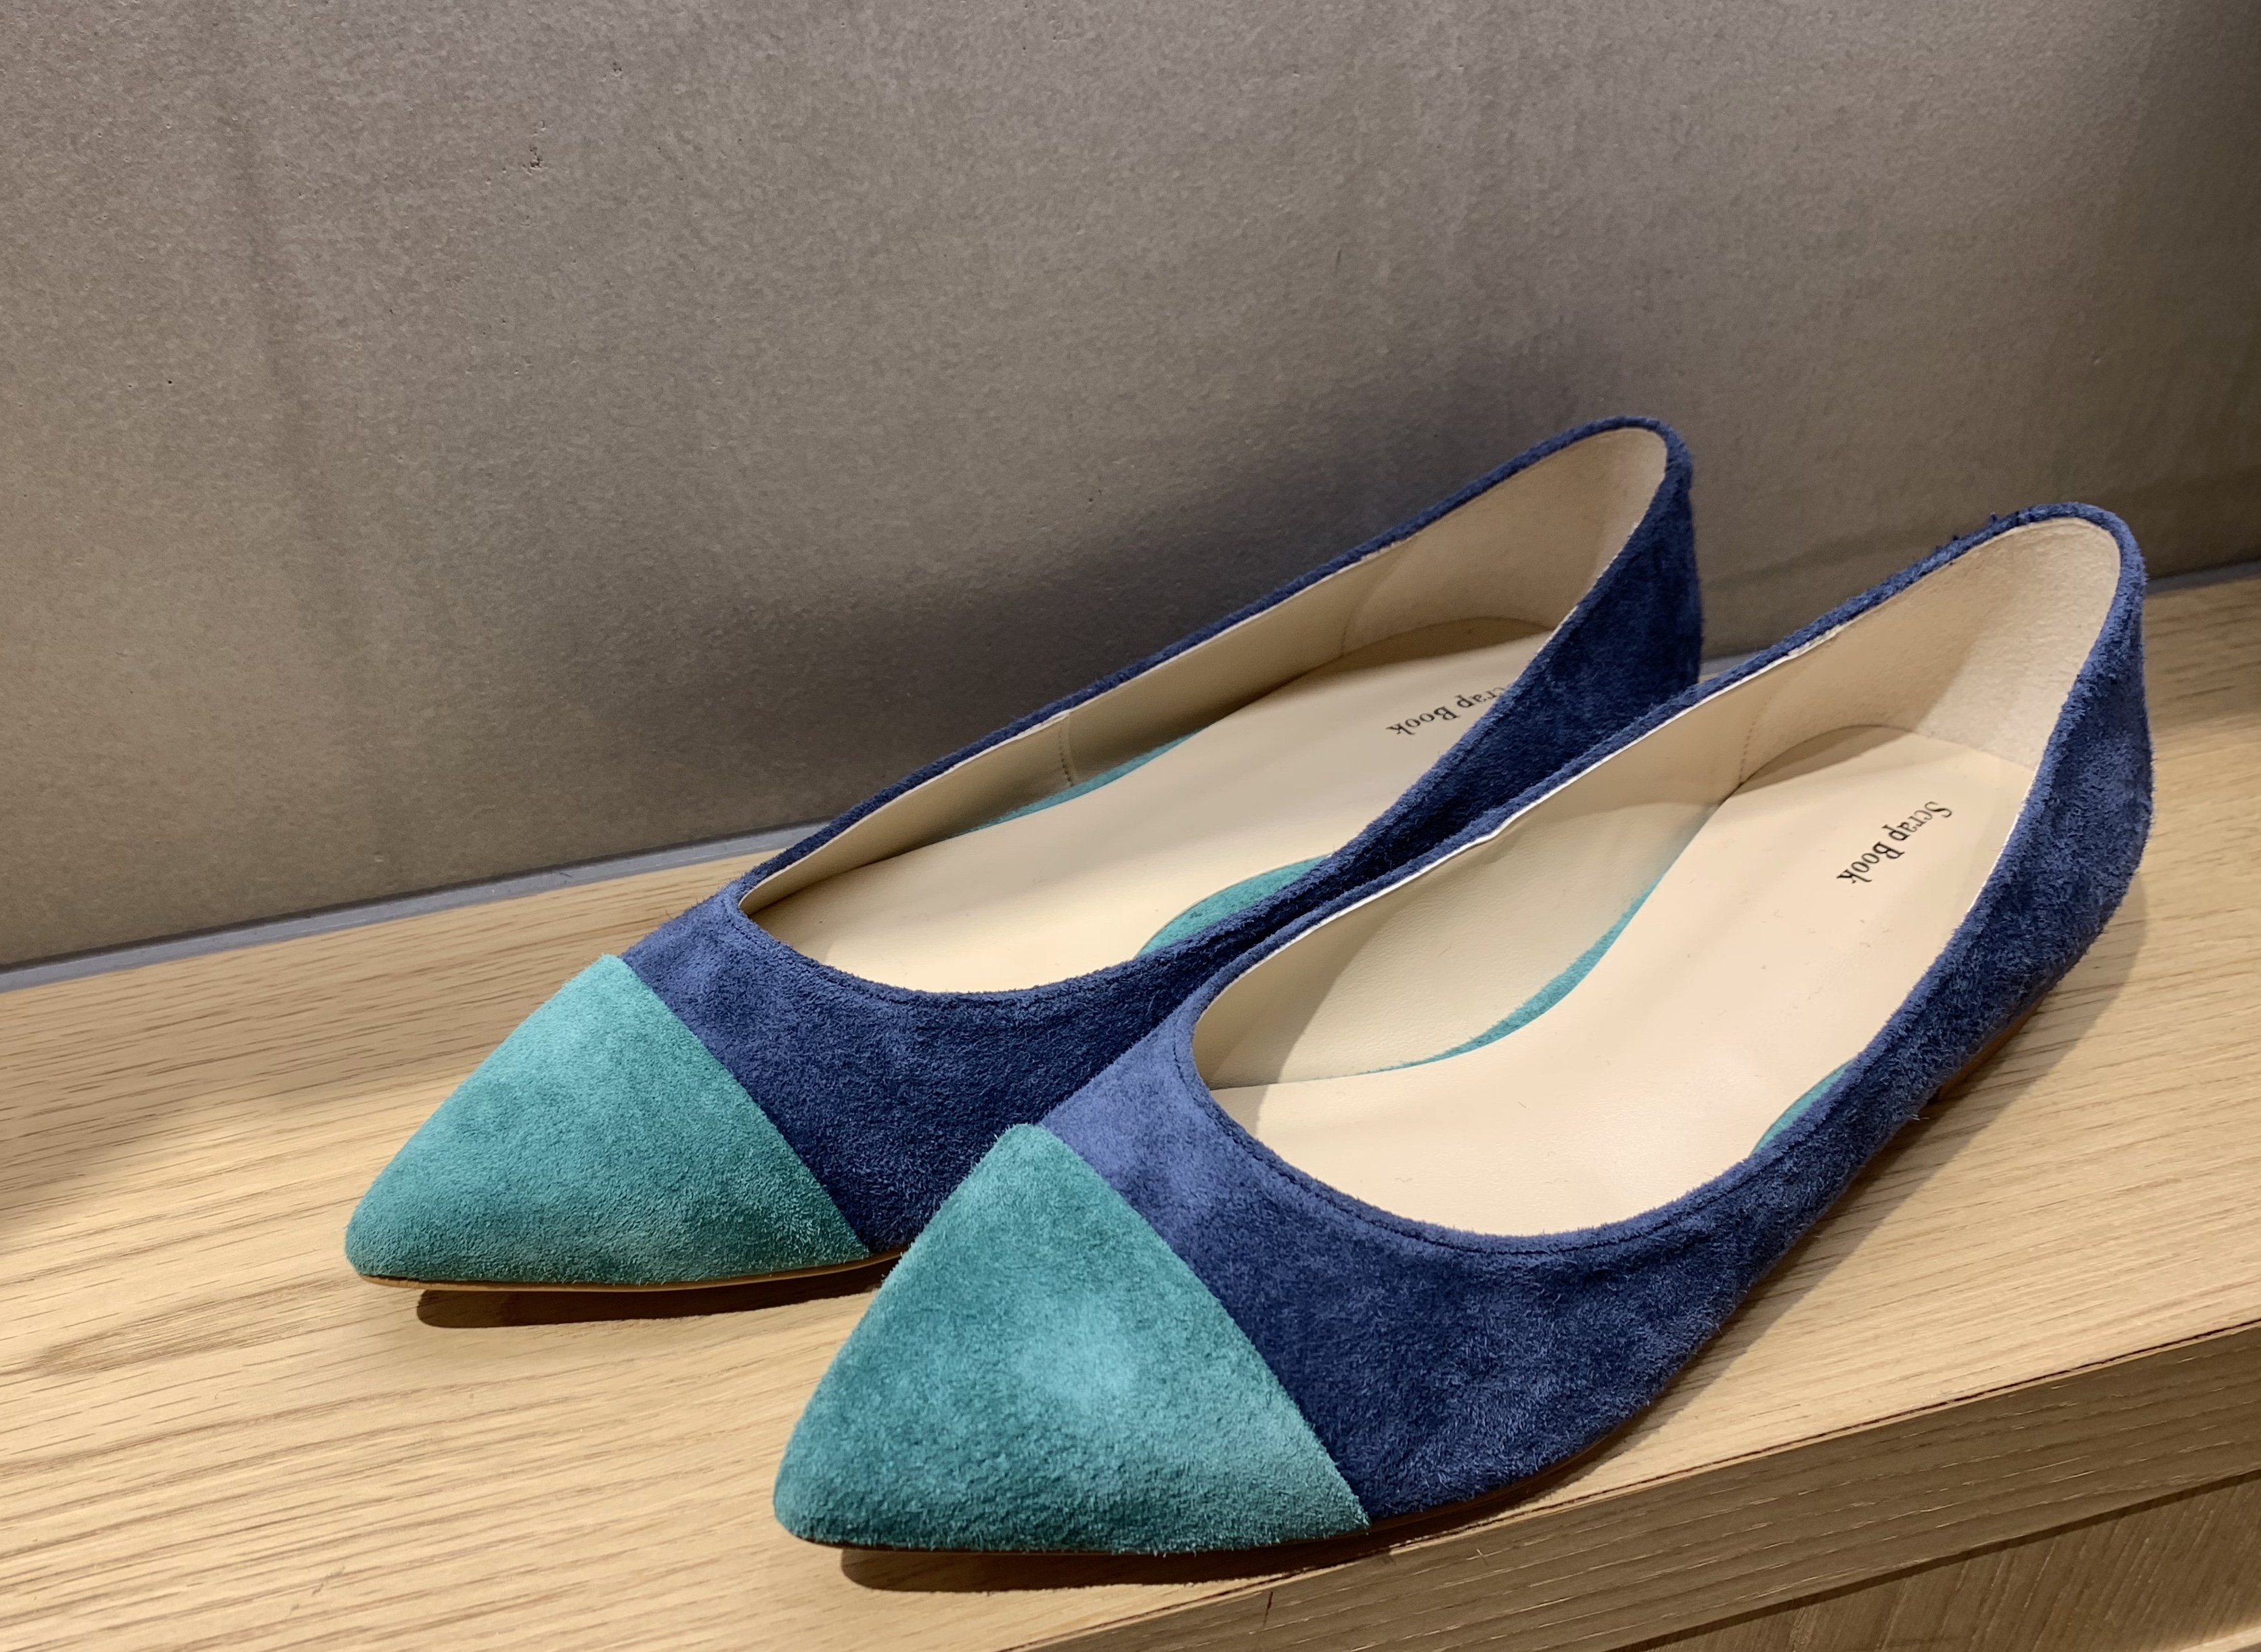 Scrap Book スクラップブック 有楽町マルイ 可愛い バイカラー bi-color シンプル フラットシューズ flat shoes 日本製 浅草 神戸 豚革 履きやすい